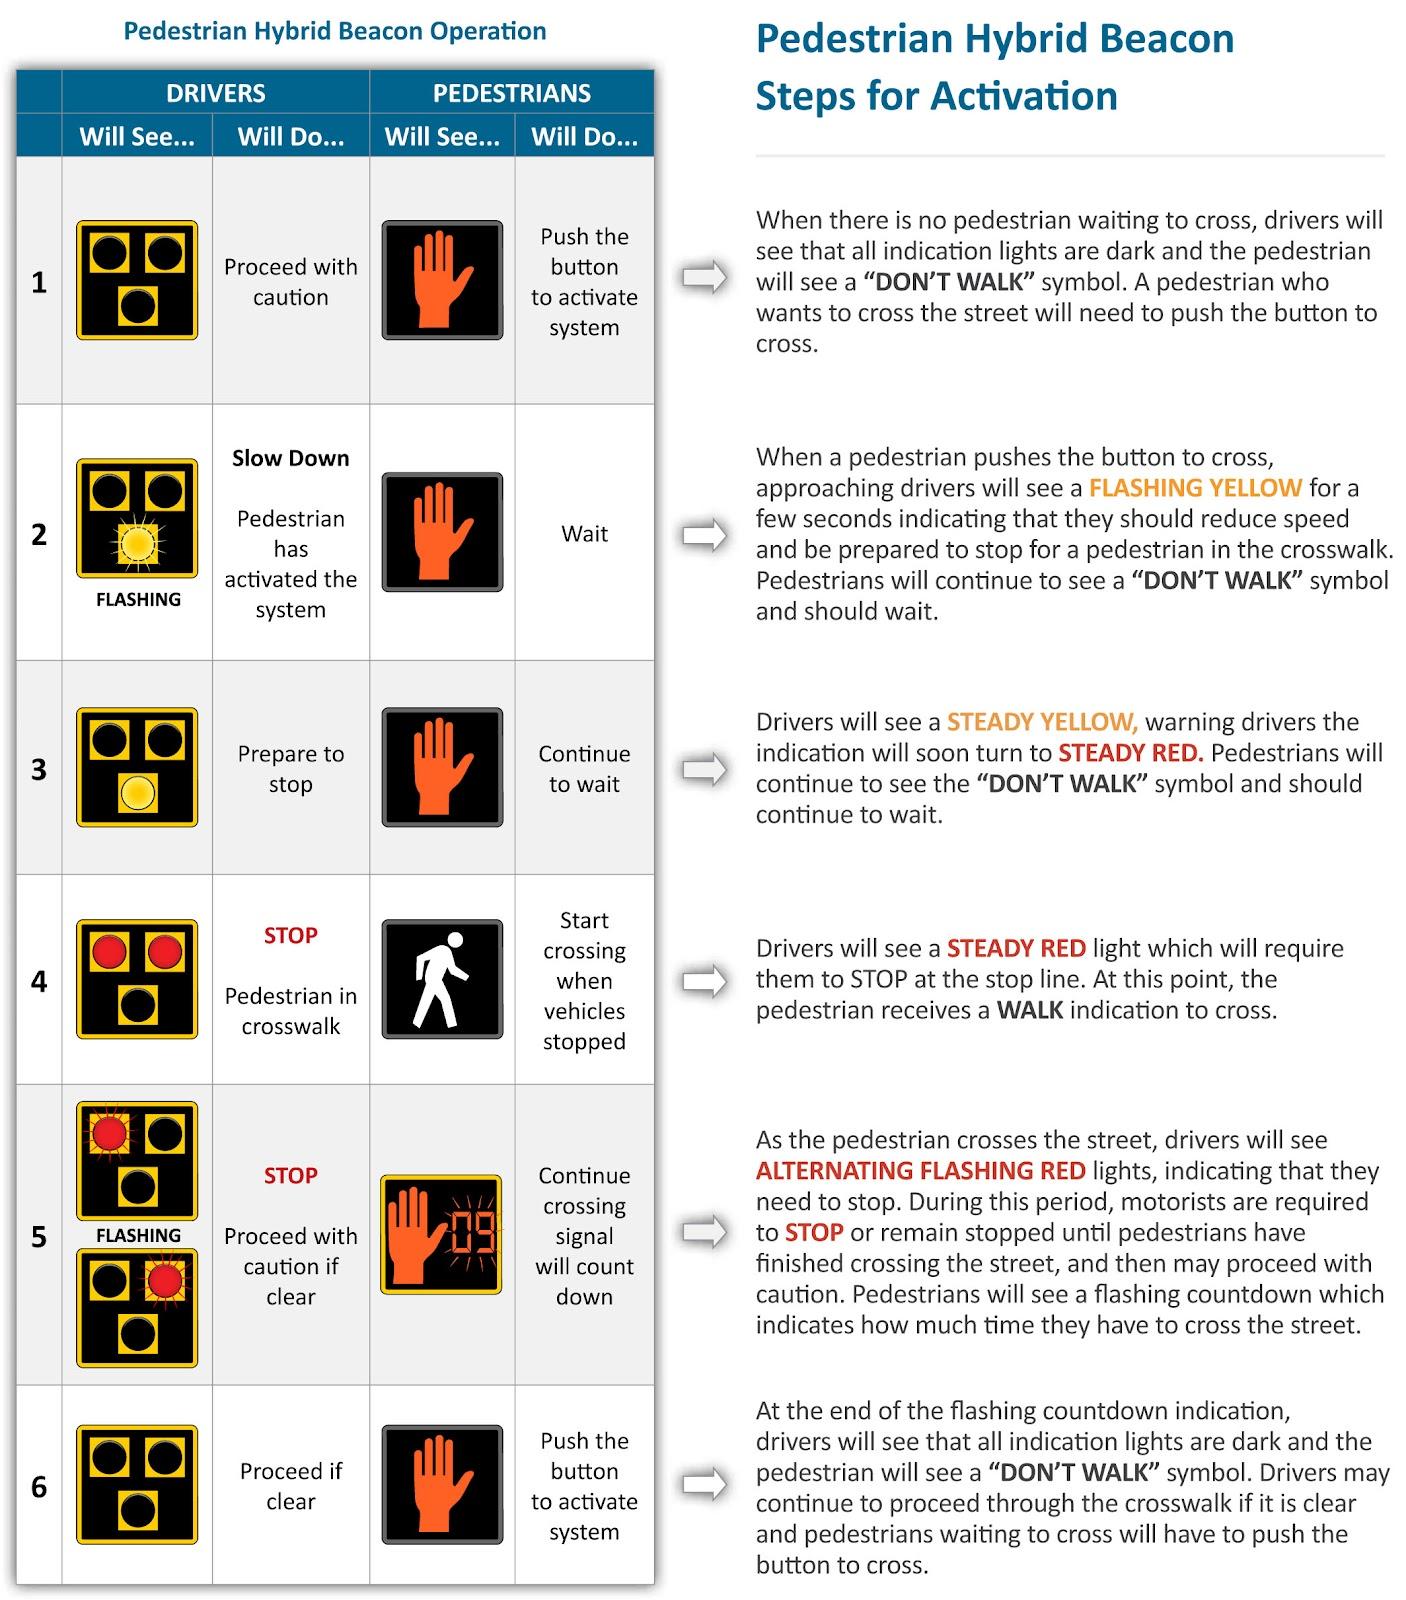 Pedestrian Hybrid Beacon Operation